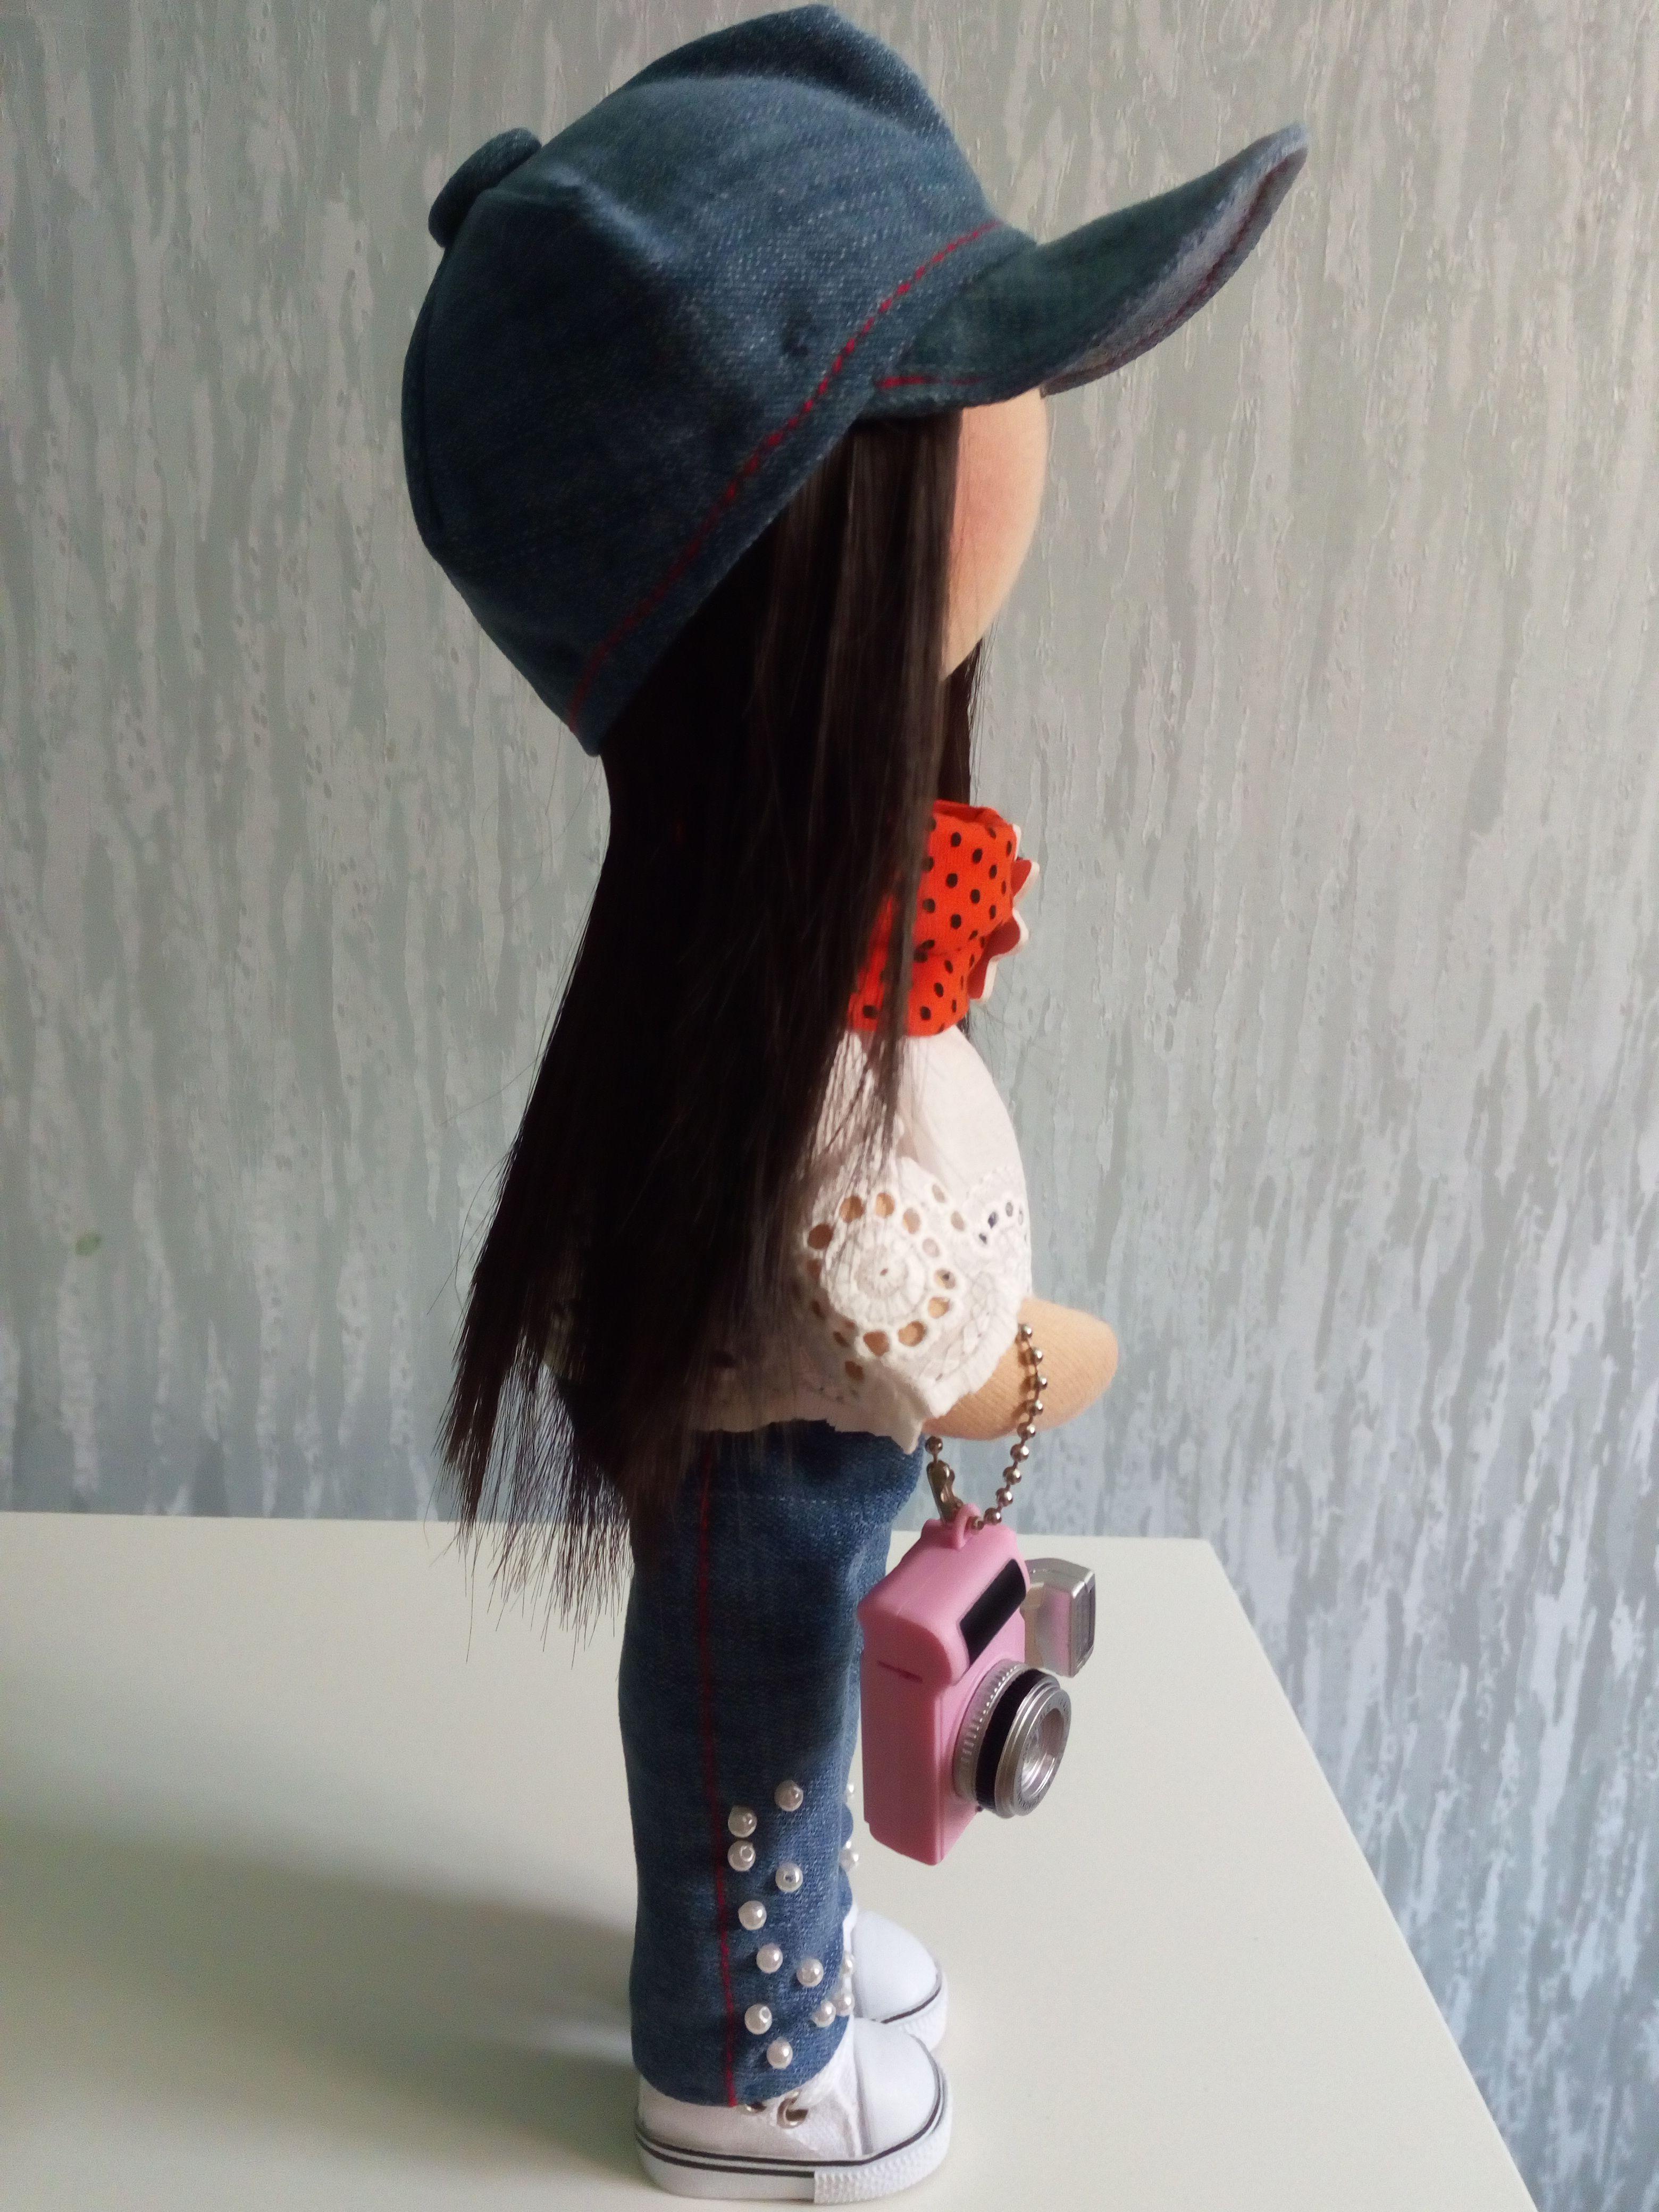 куклавподарок куклатильда кукла тильда ручнаяработа подарок